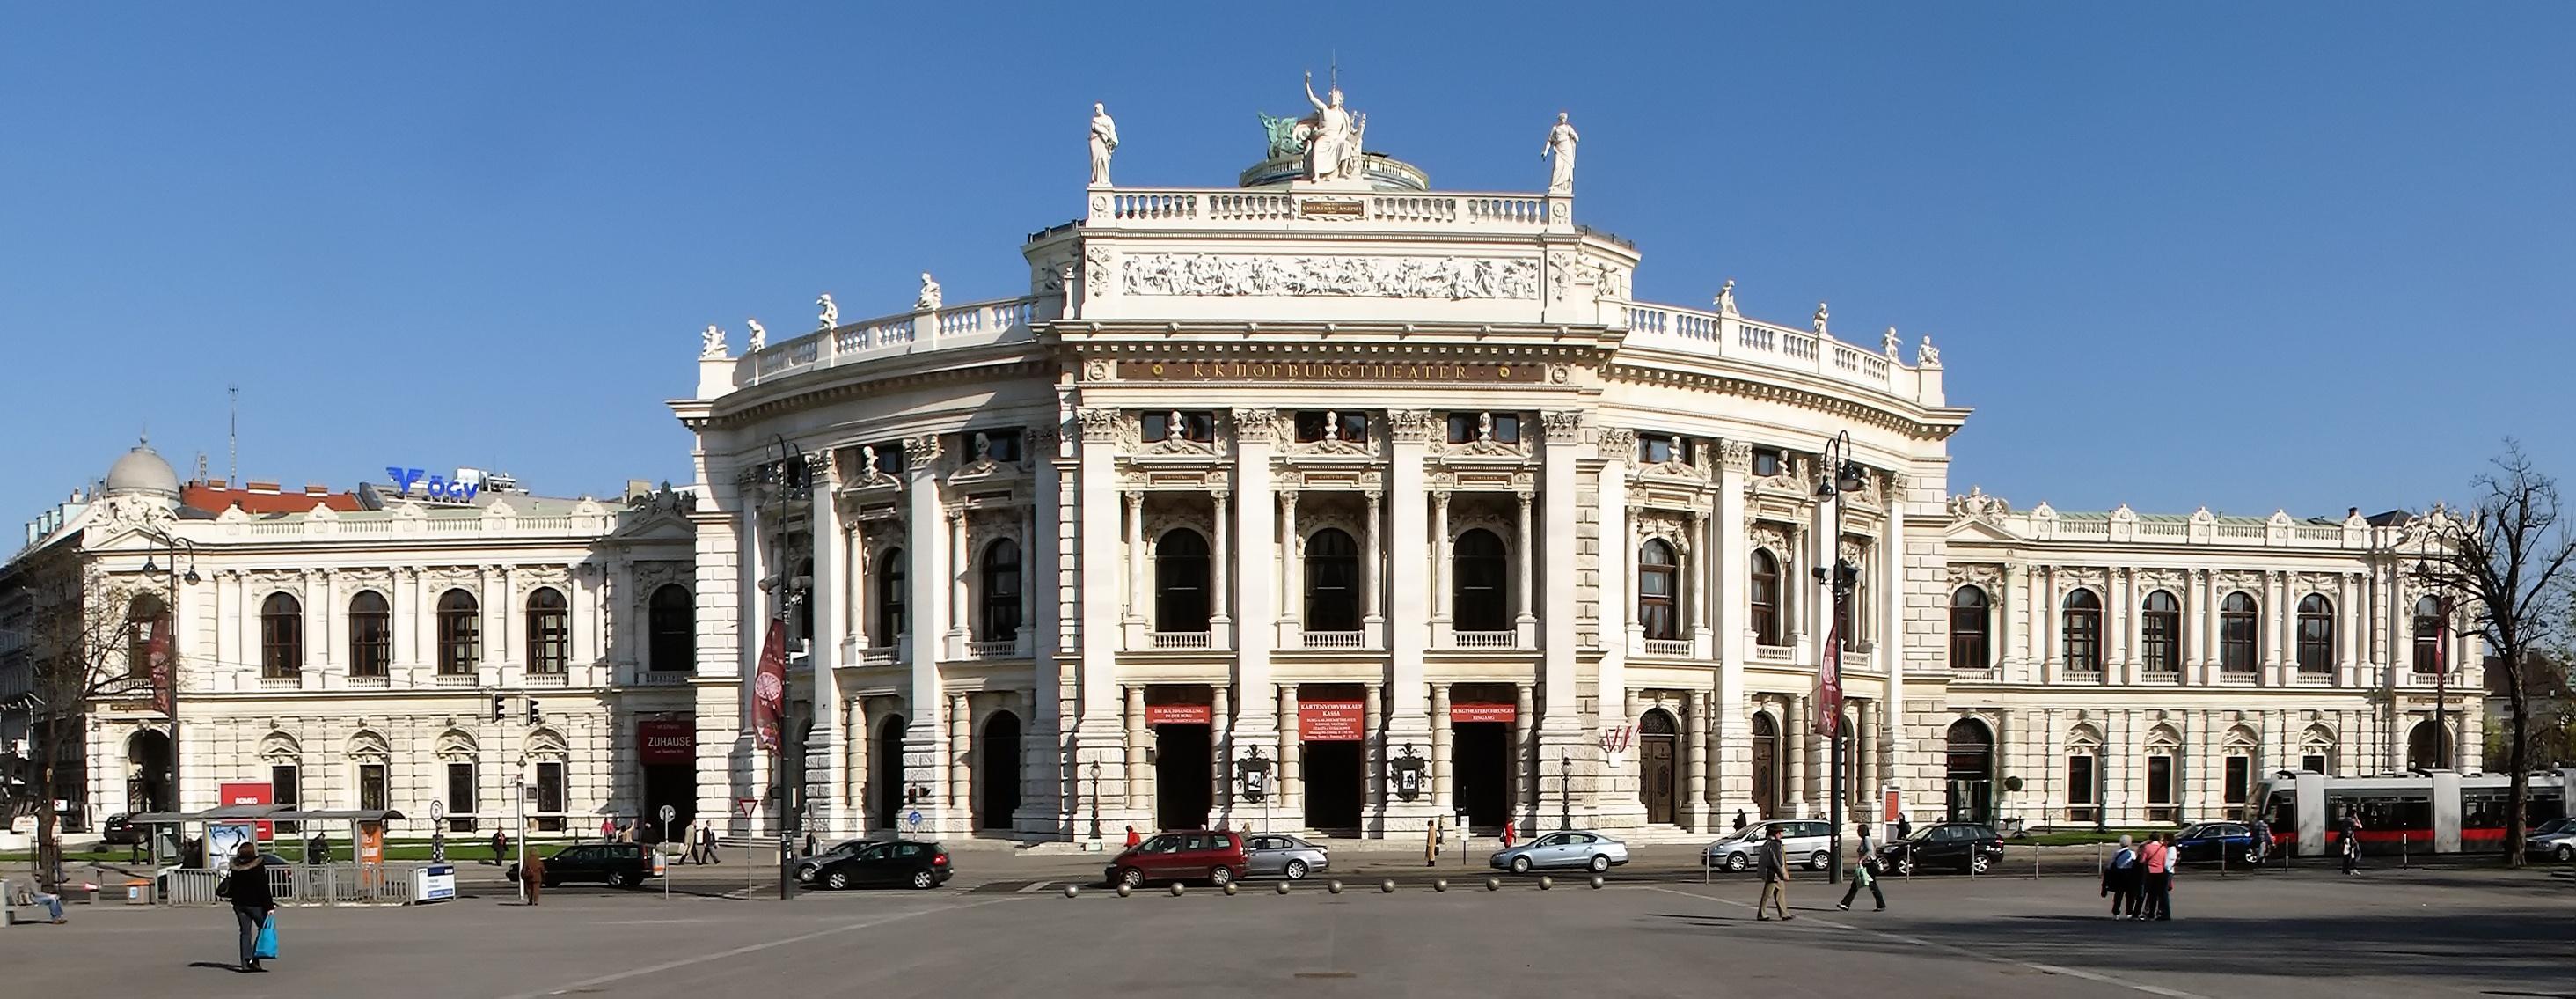 Burg Theater Uetersen